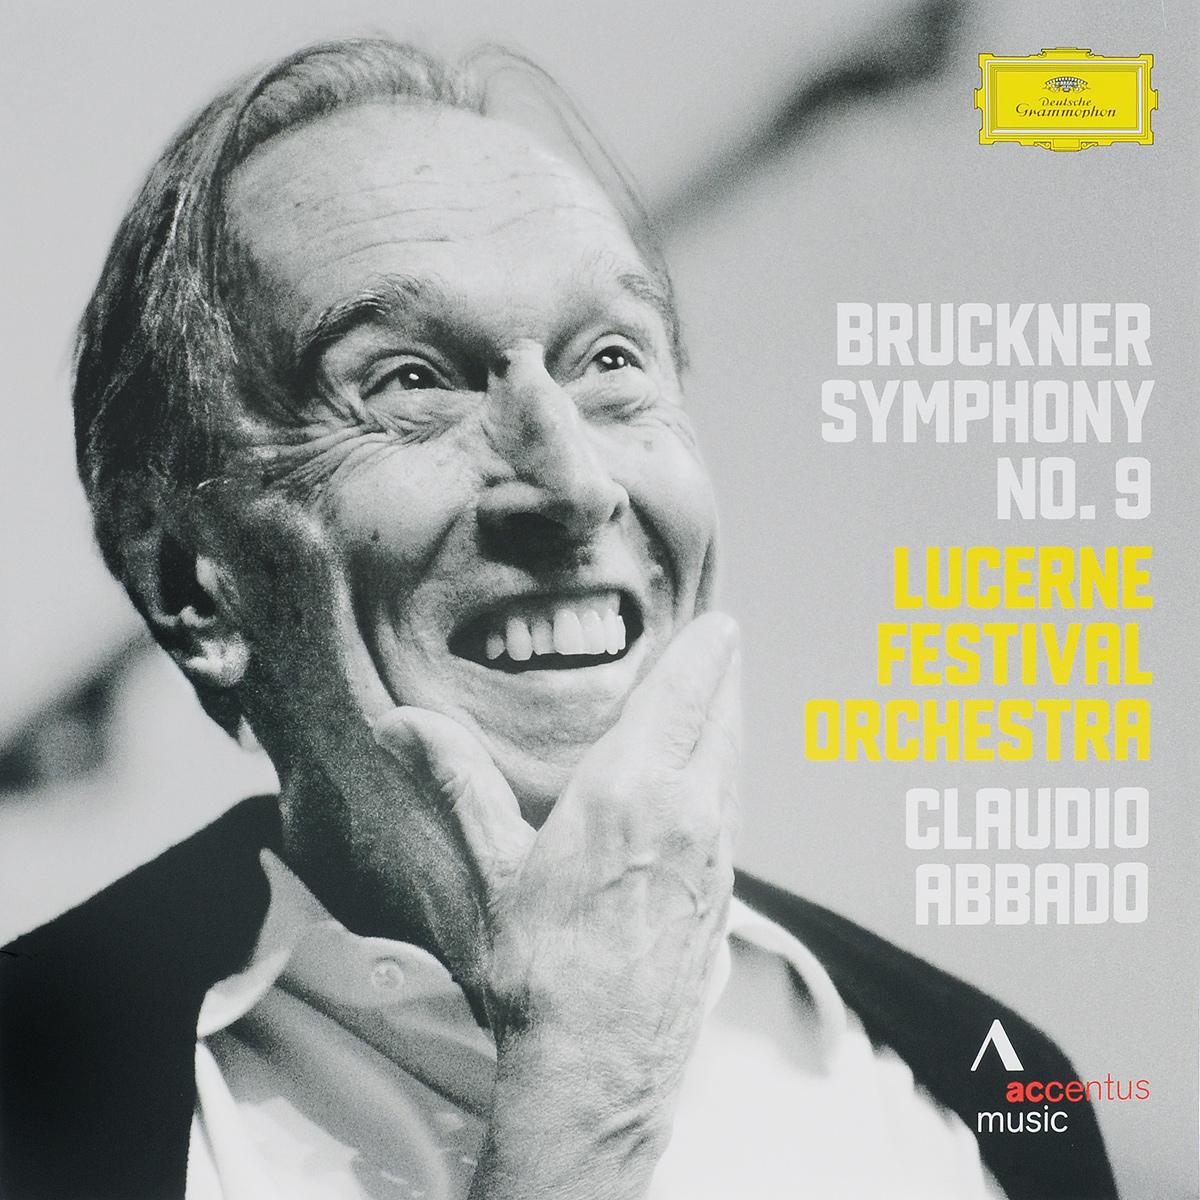 Lucerne Festival Orchestra,Клаудио Аббадо Bruckner: Symphony No. 9. Lucerne Festival Orchestra / Claudio Abbado (2 LP) mahler debussy abbado lucerne festival orchestra 2 cd